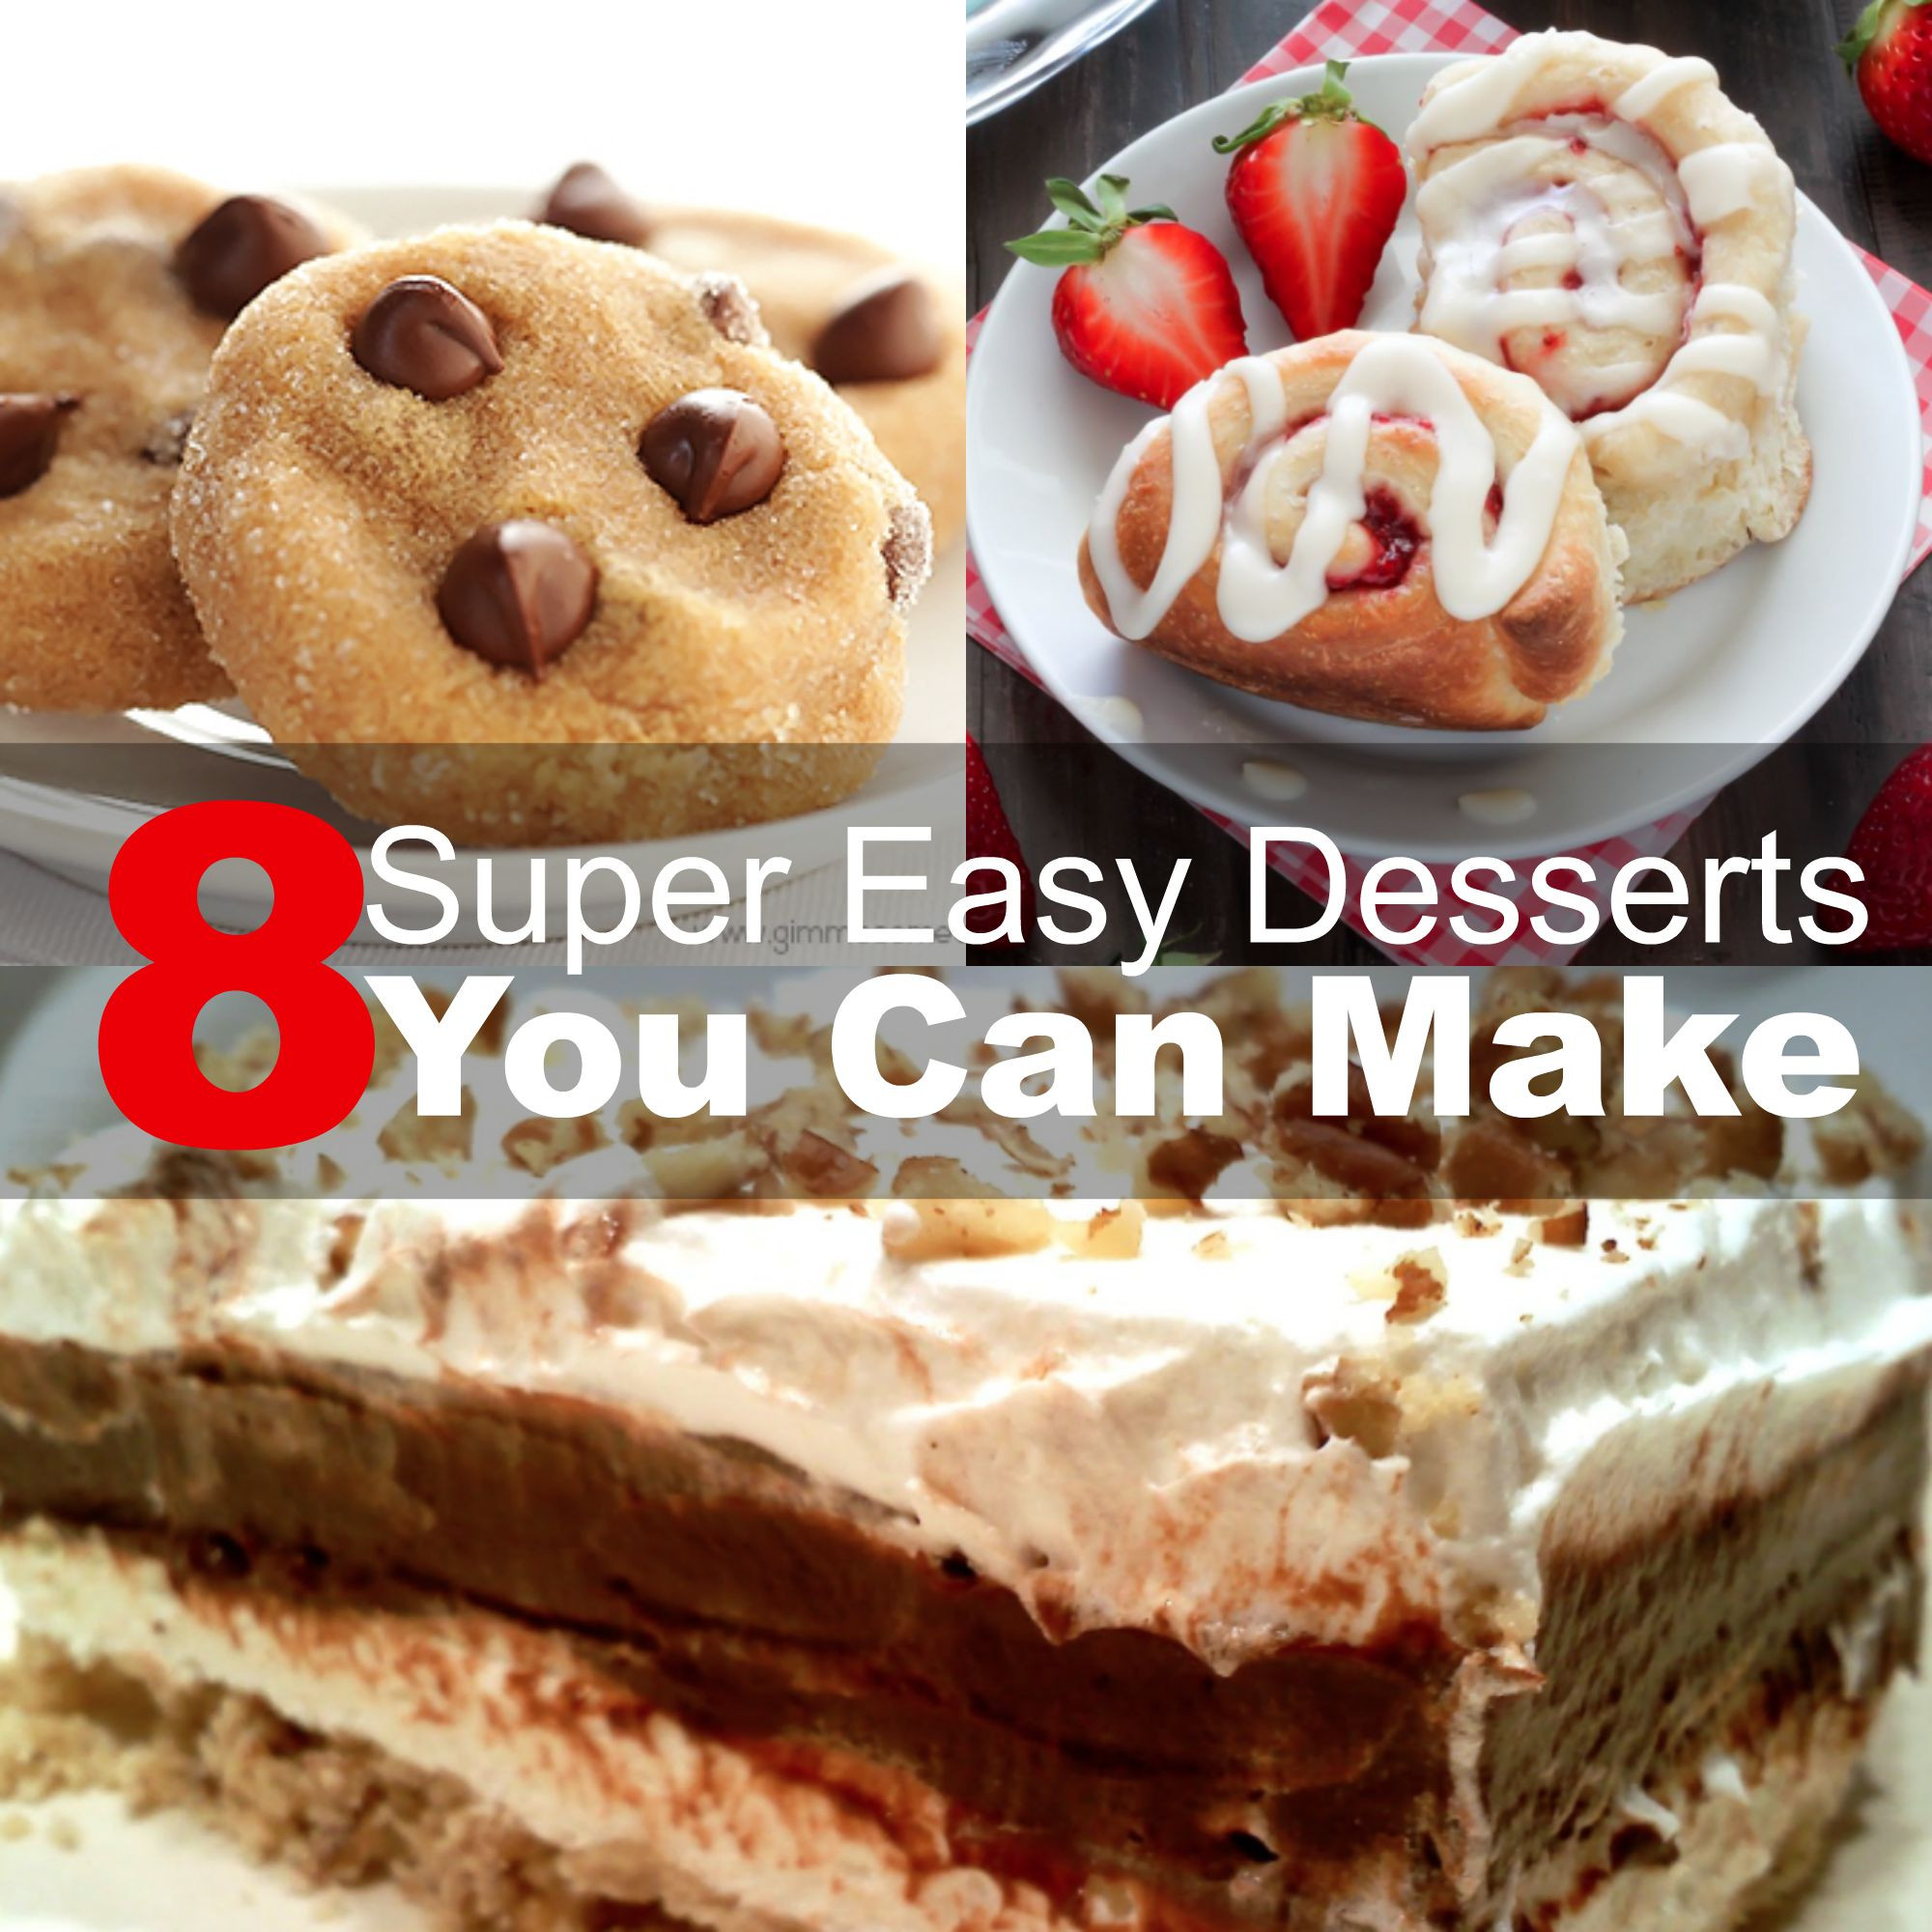 Super Easy Desserts  8 Super Easy Desserts You Can Make